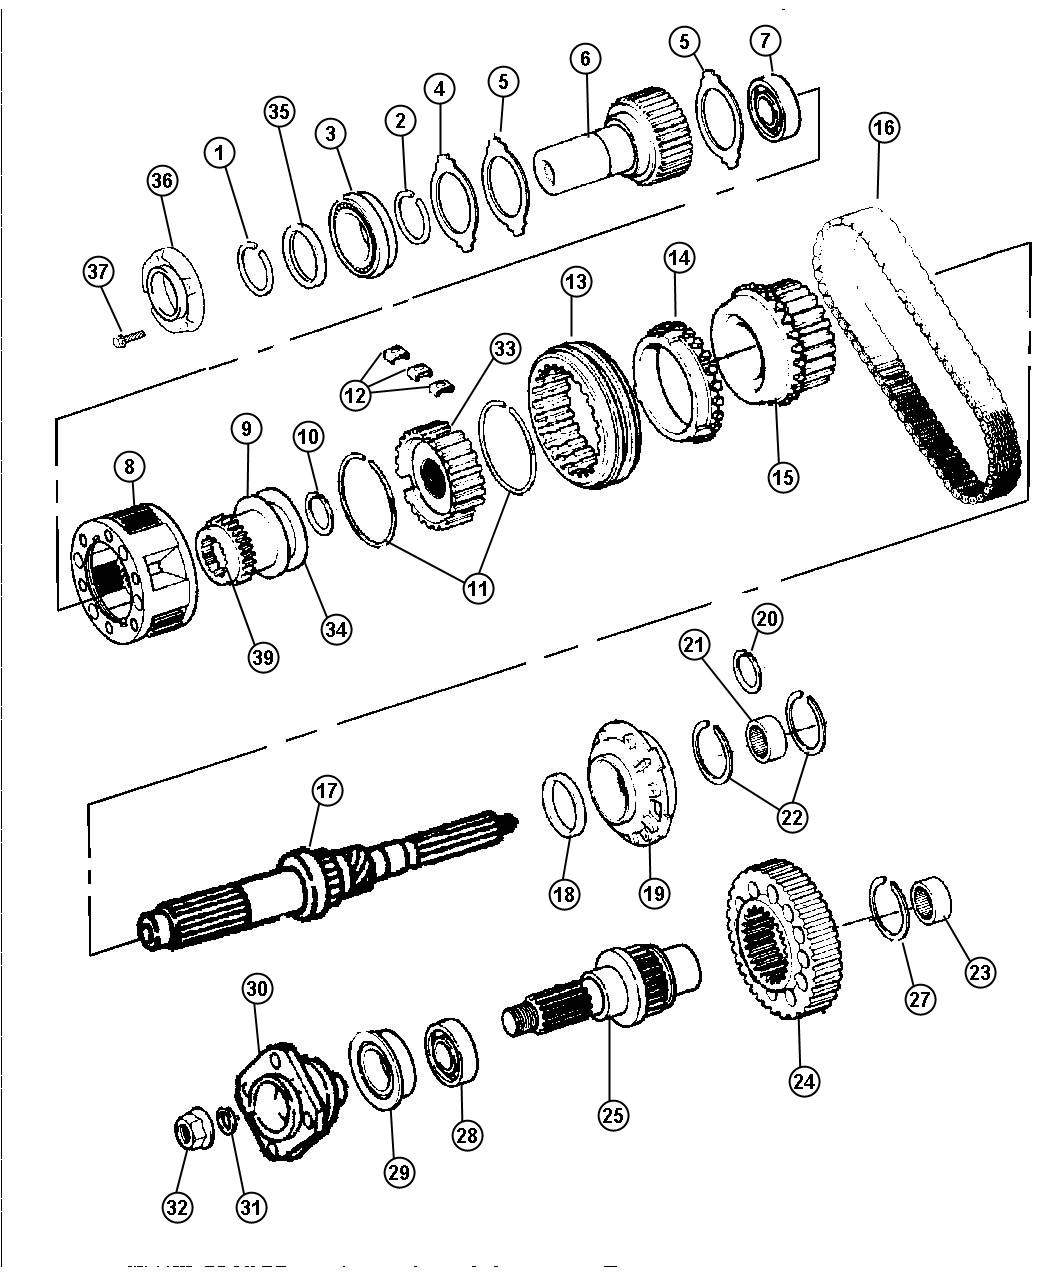 Dodge Ram 1500 Pump. Transfer case oil. Automatic